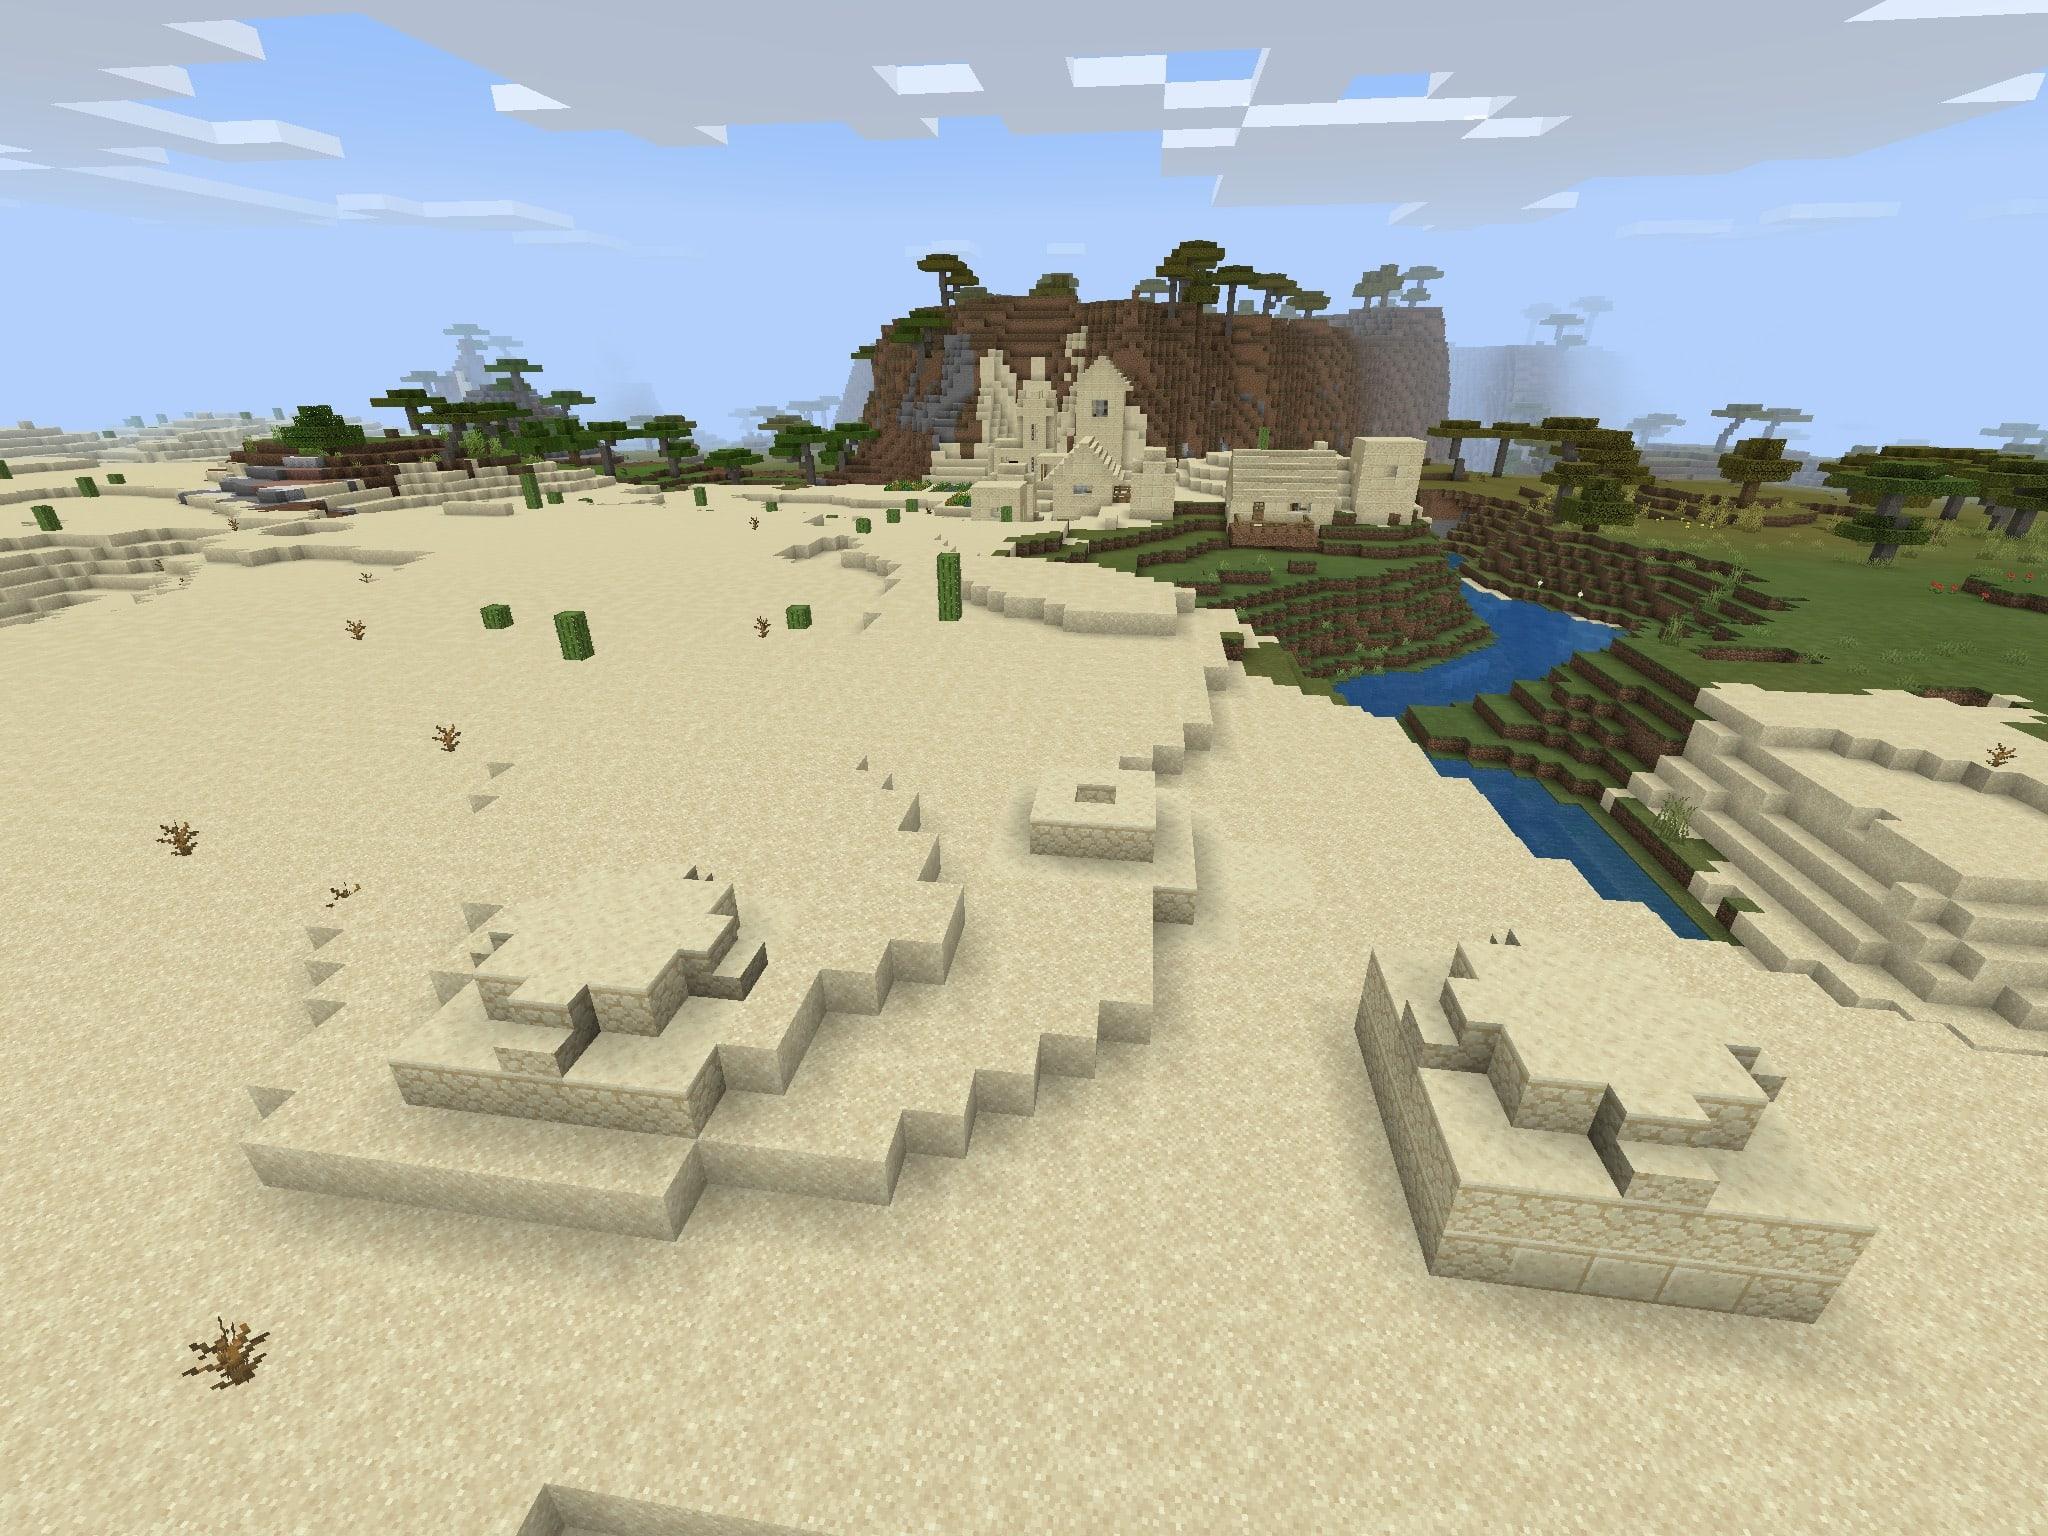 Minecraft PE Seed - Bedrock Loot